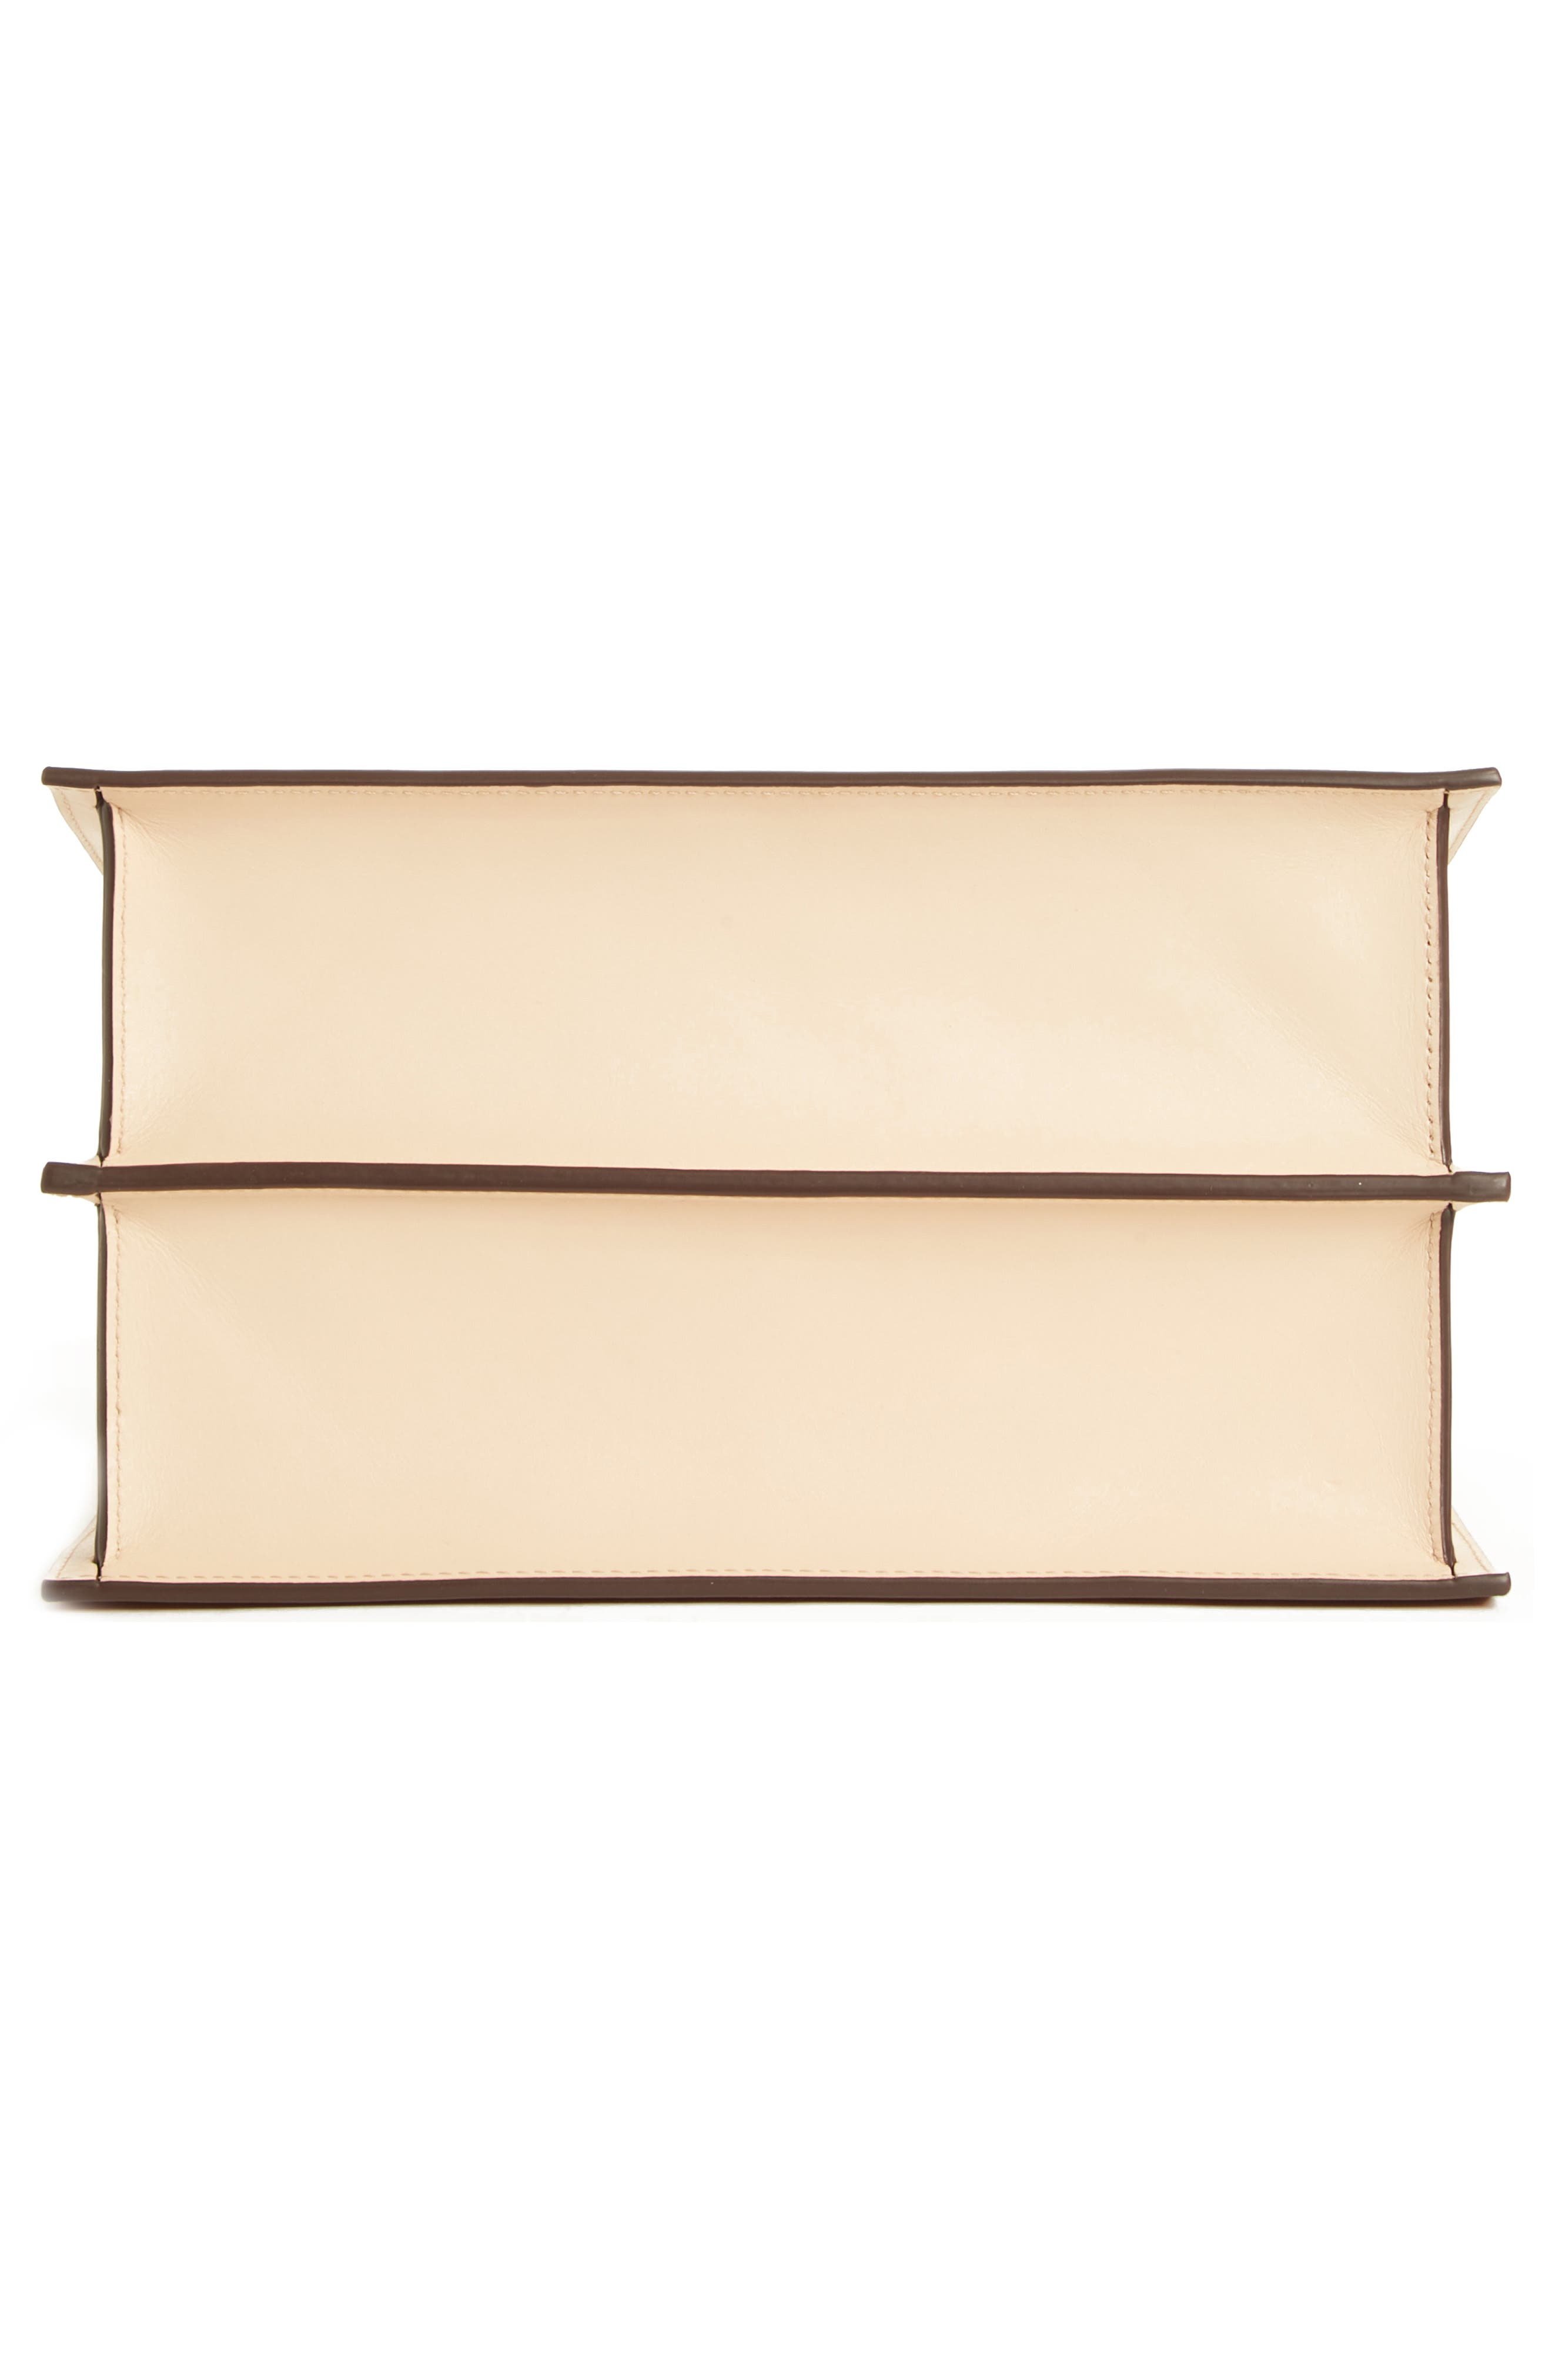 Phoebe Leather Crossbody Bag,                             Alternate thumbnail 7, color,                             SAND/ AMBER